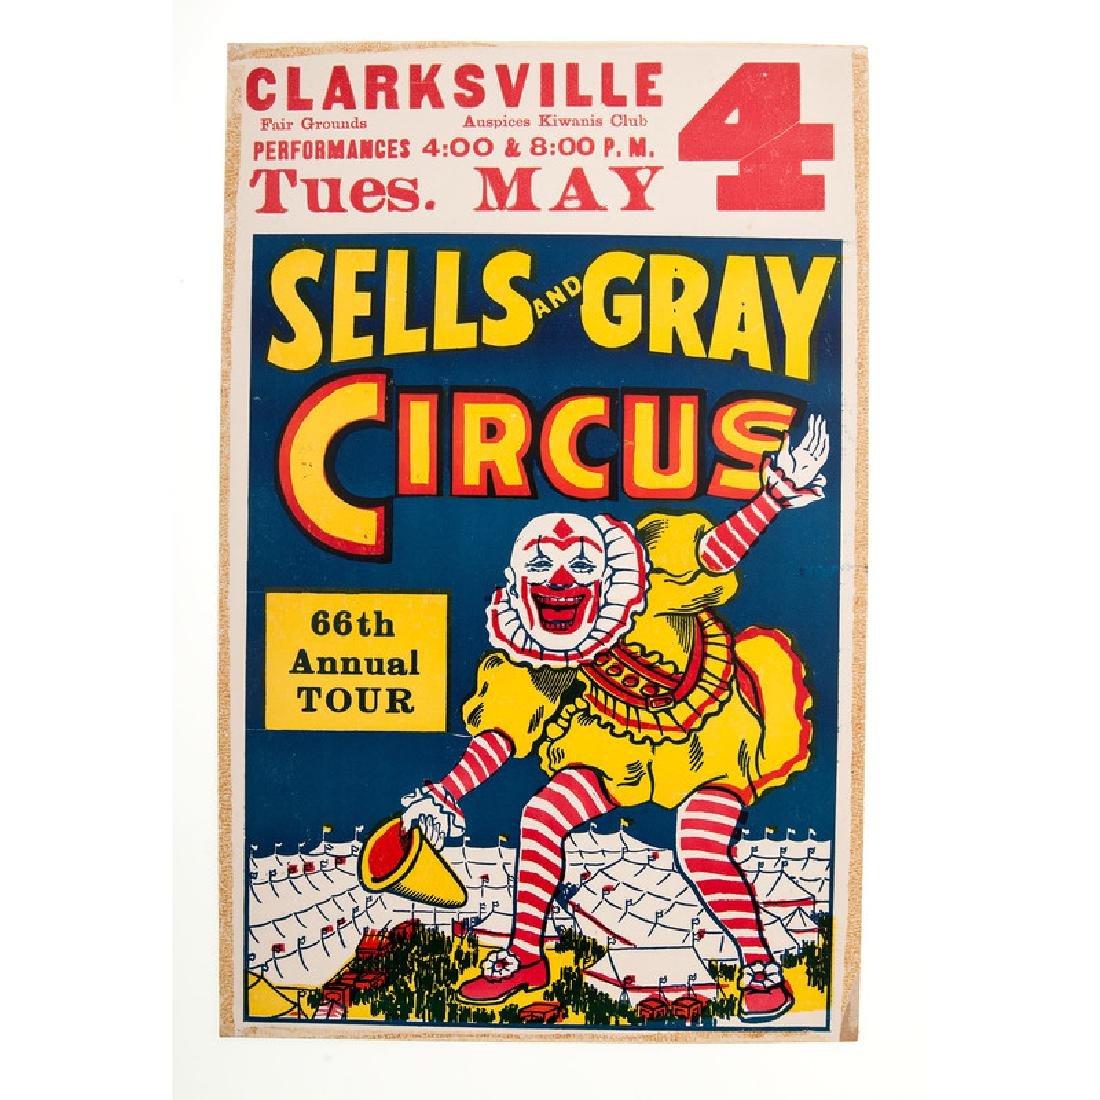 American Circus Posters - 6